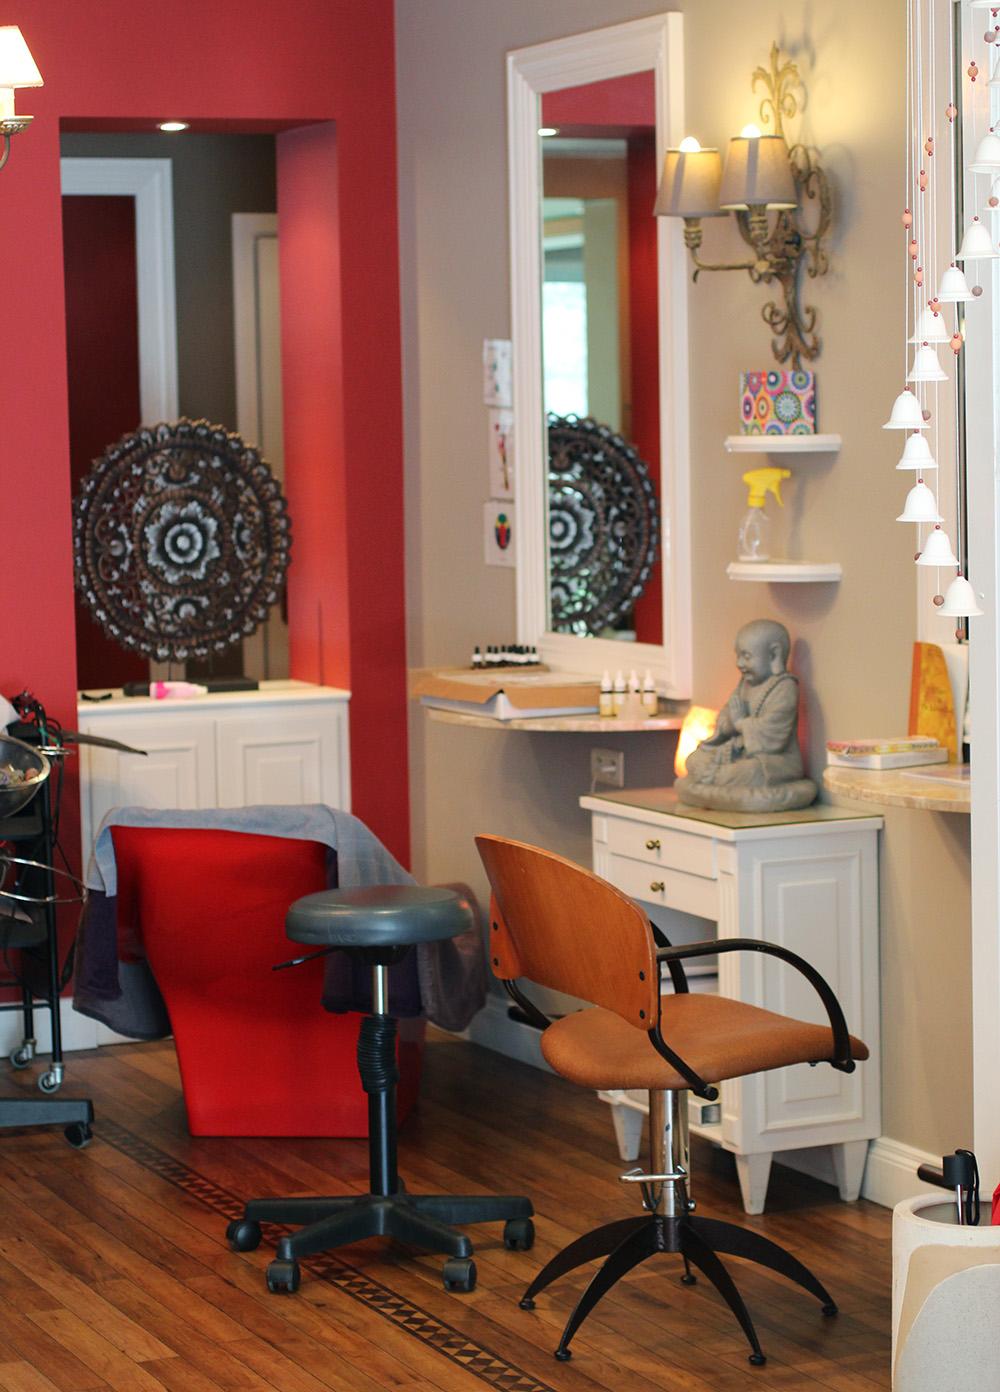 Recherche nom salon de coiffure coiffures modernes et for Salon de coiffure qui recherche apprenti